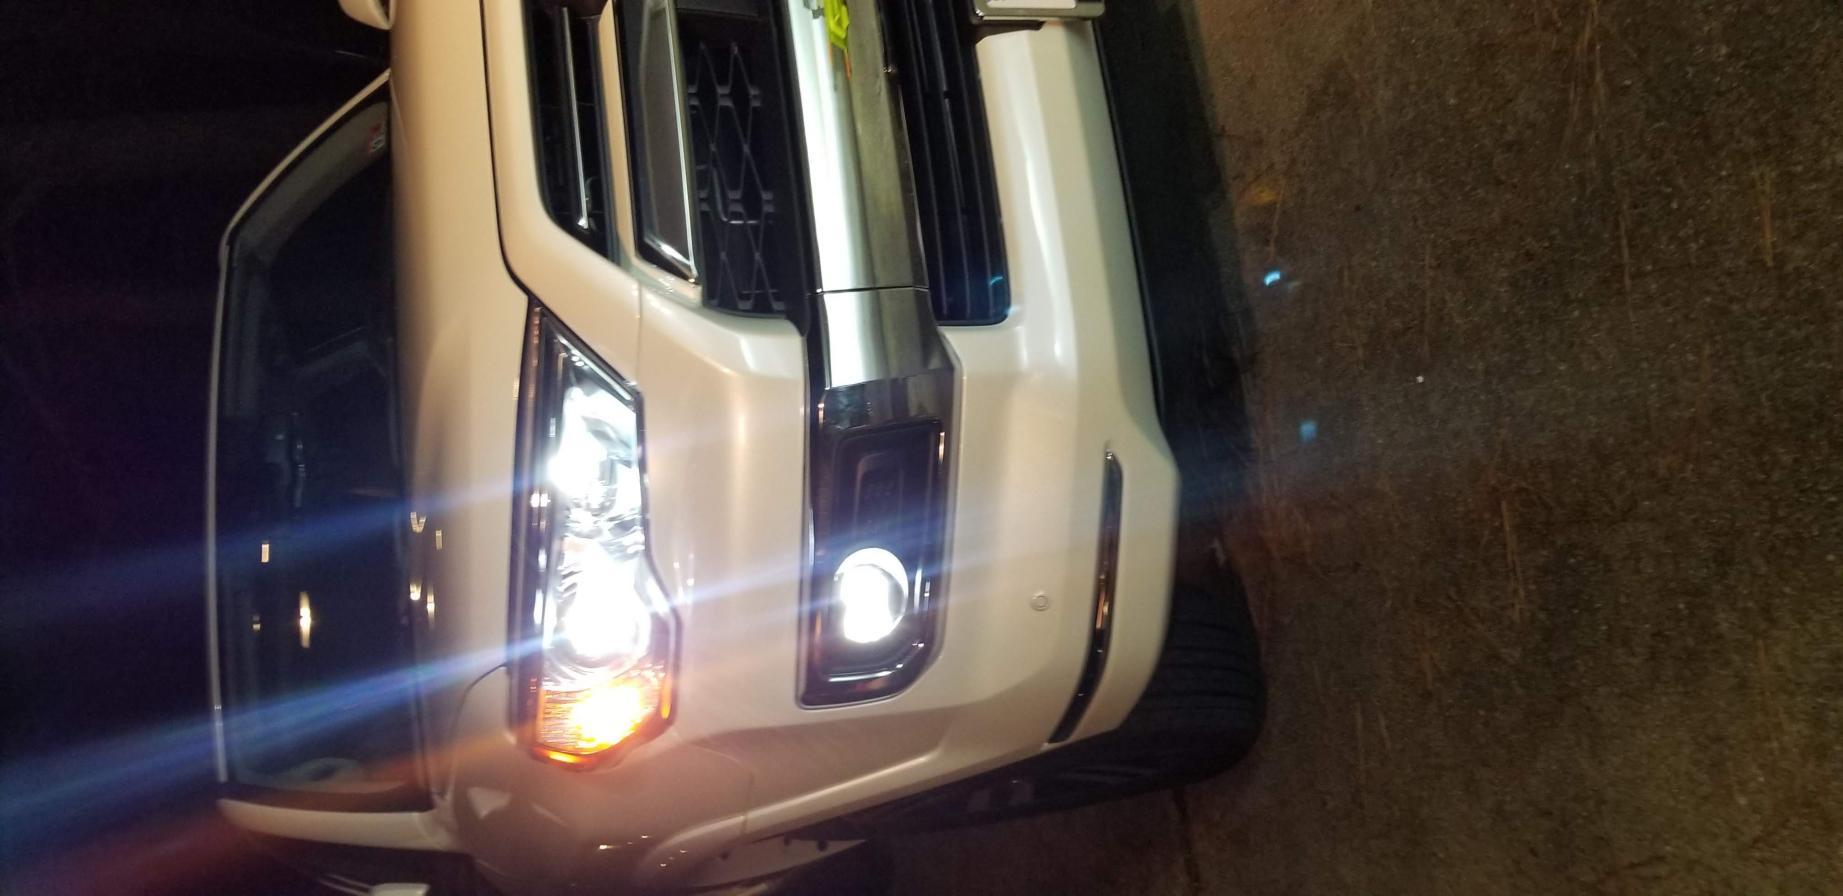 2021 4Runner OEM LED Headlights/Lights Performance and Retrofit-20201014_191738-jpg